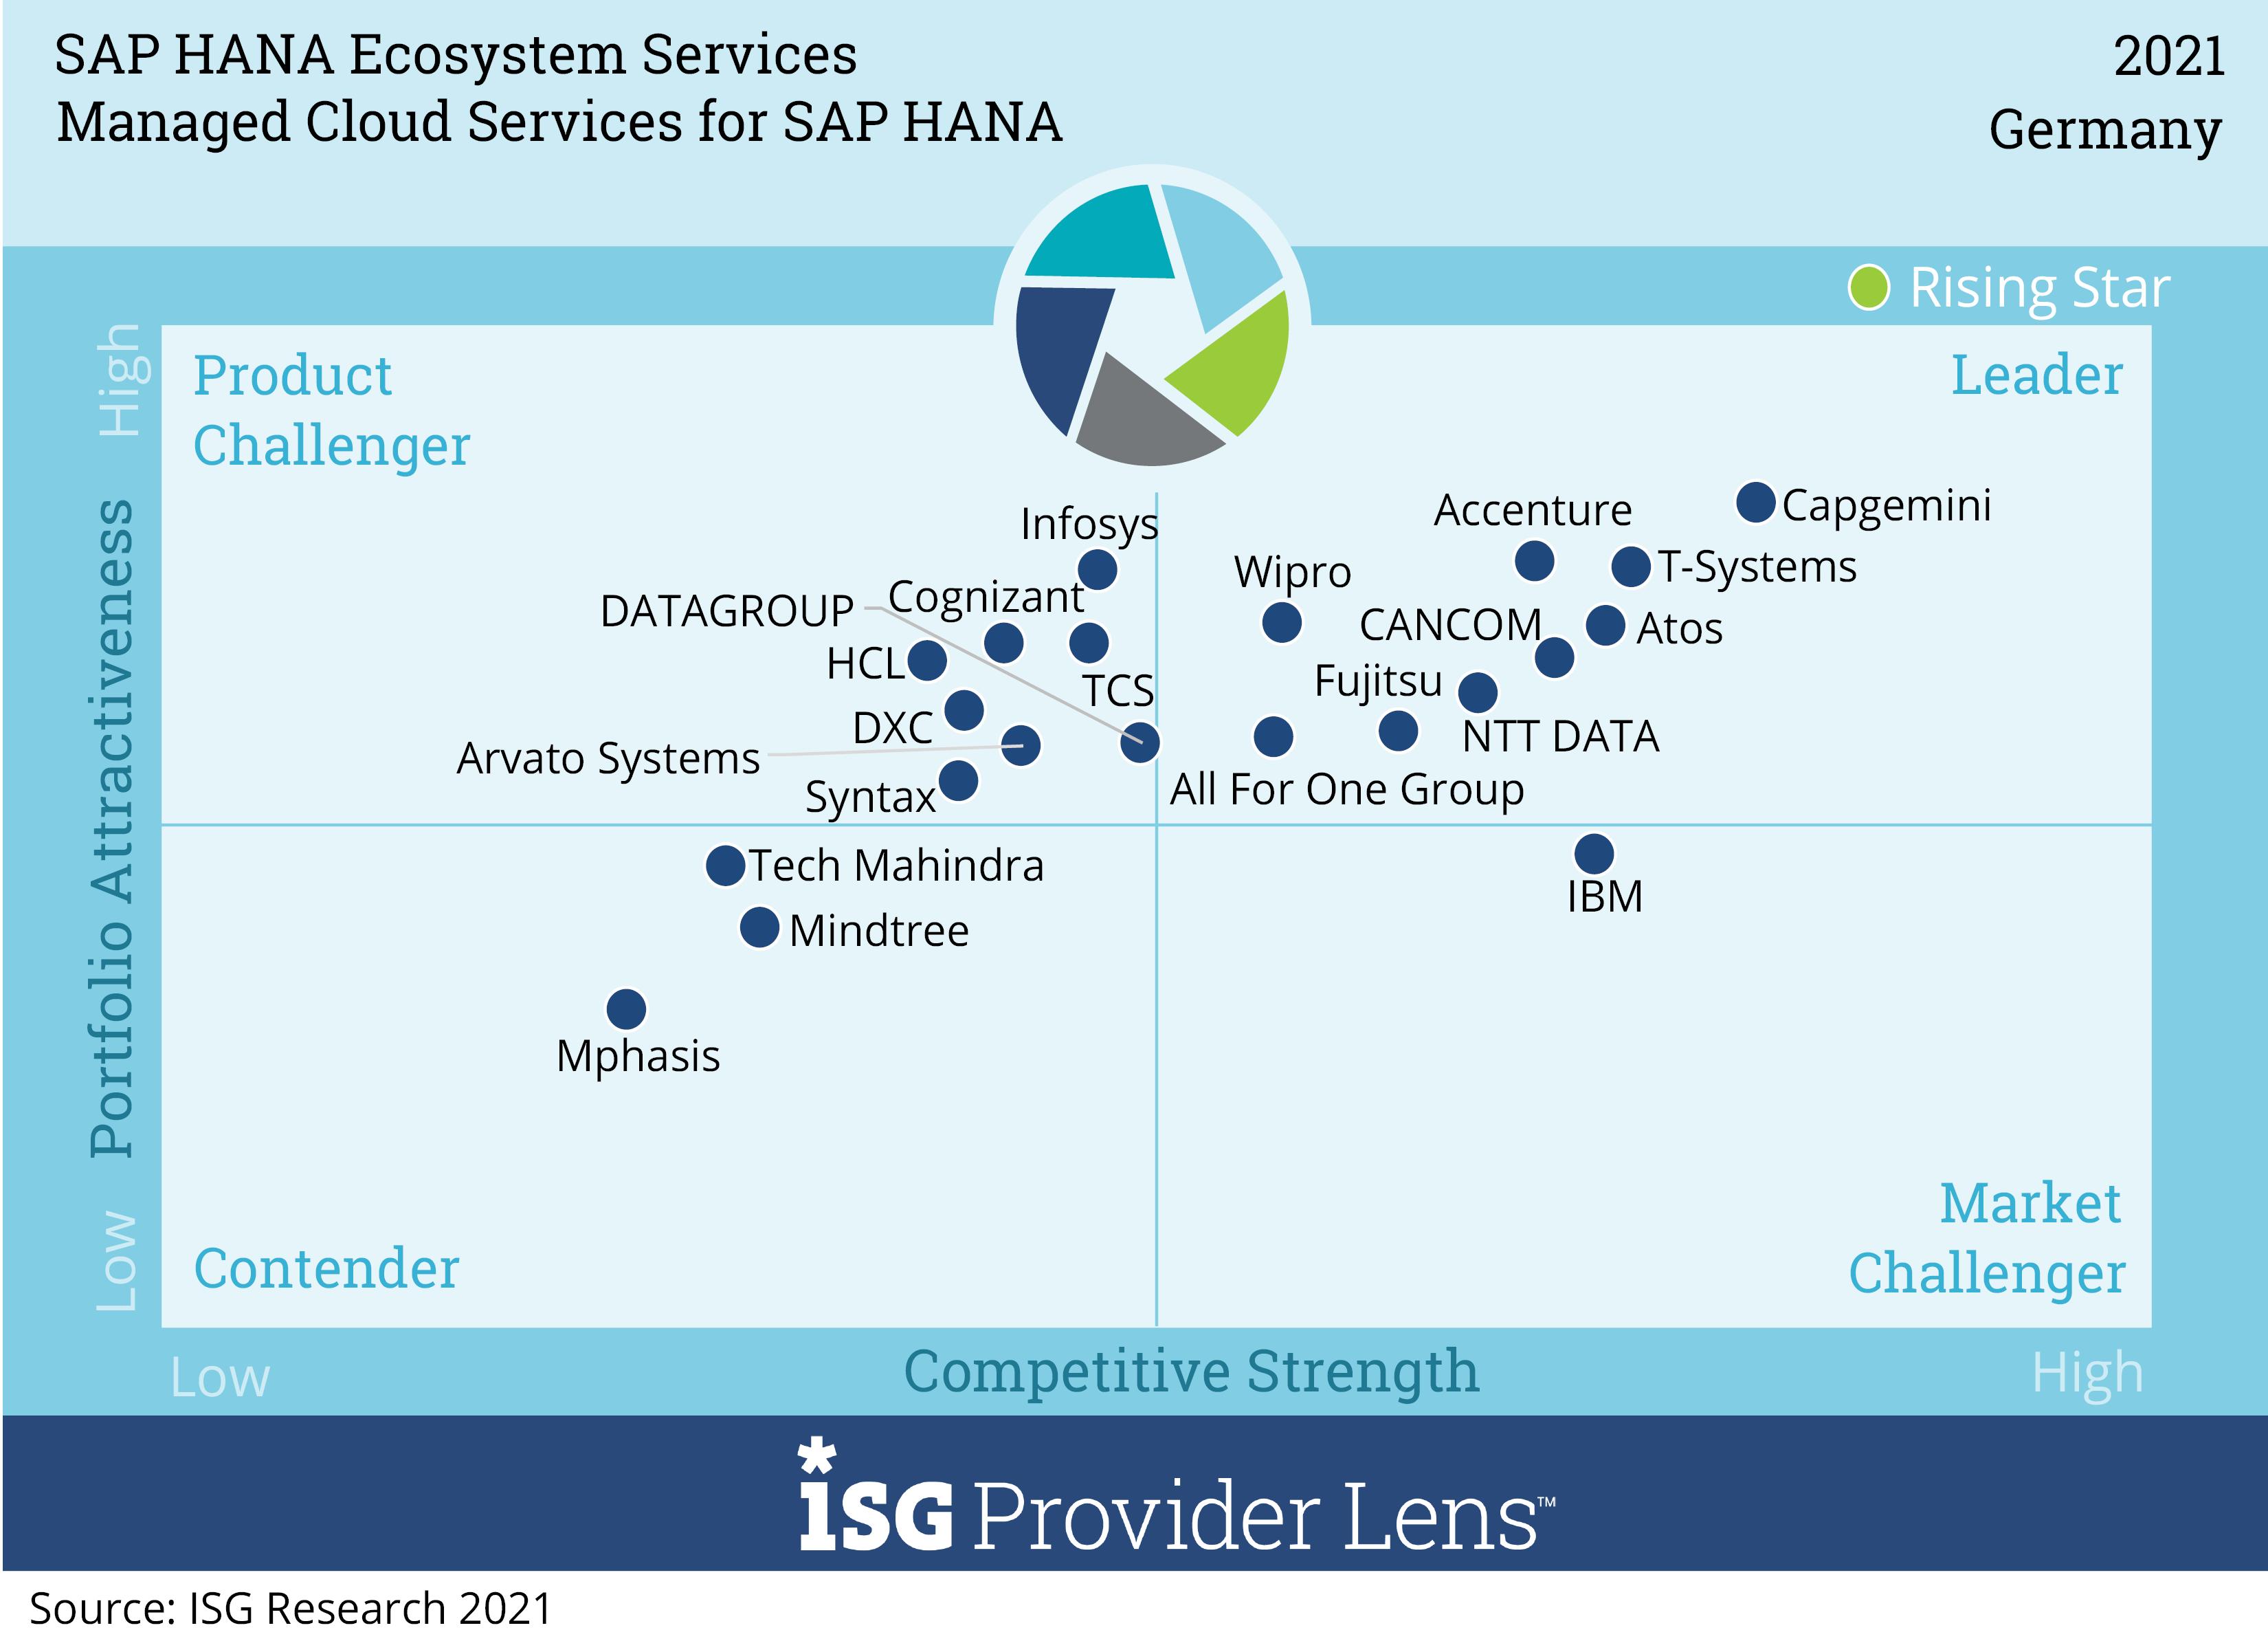 Managed Cloud Services for SAP HANA